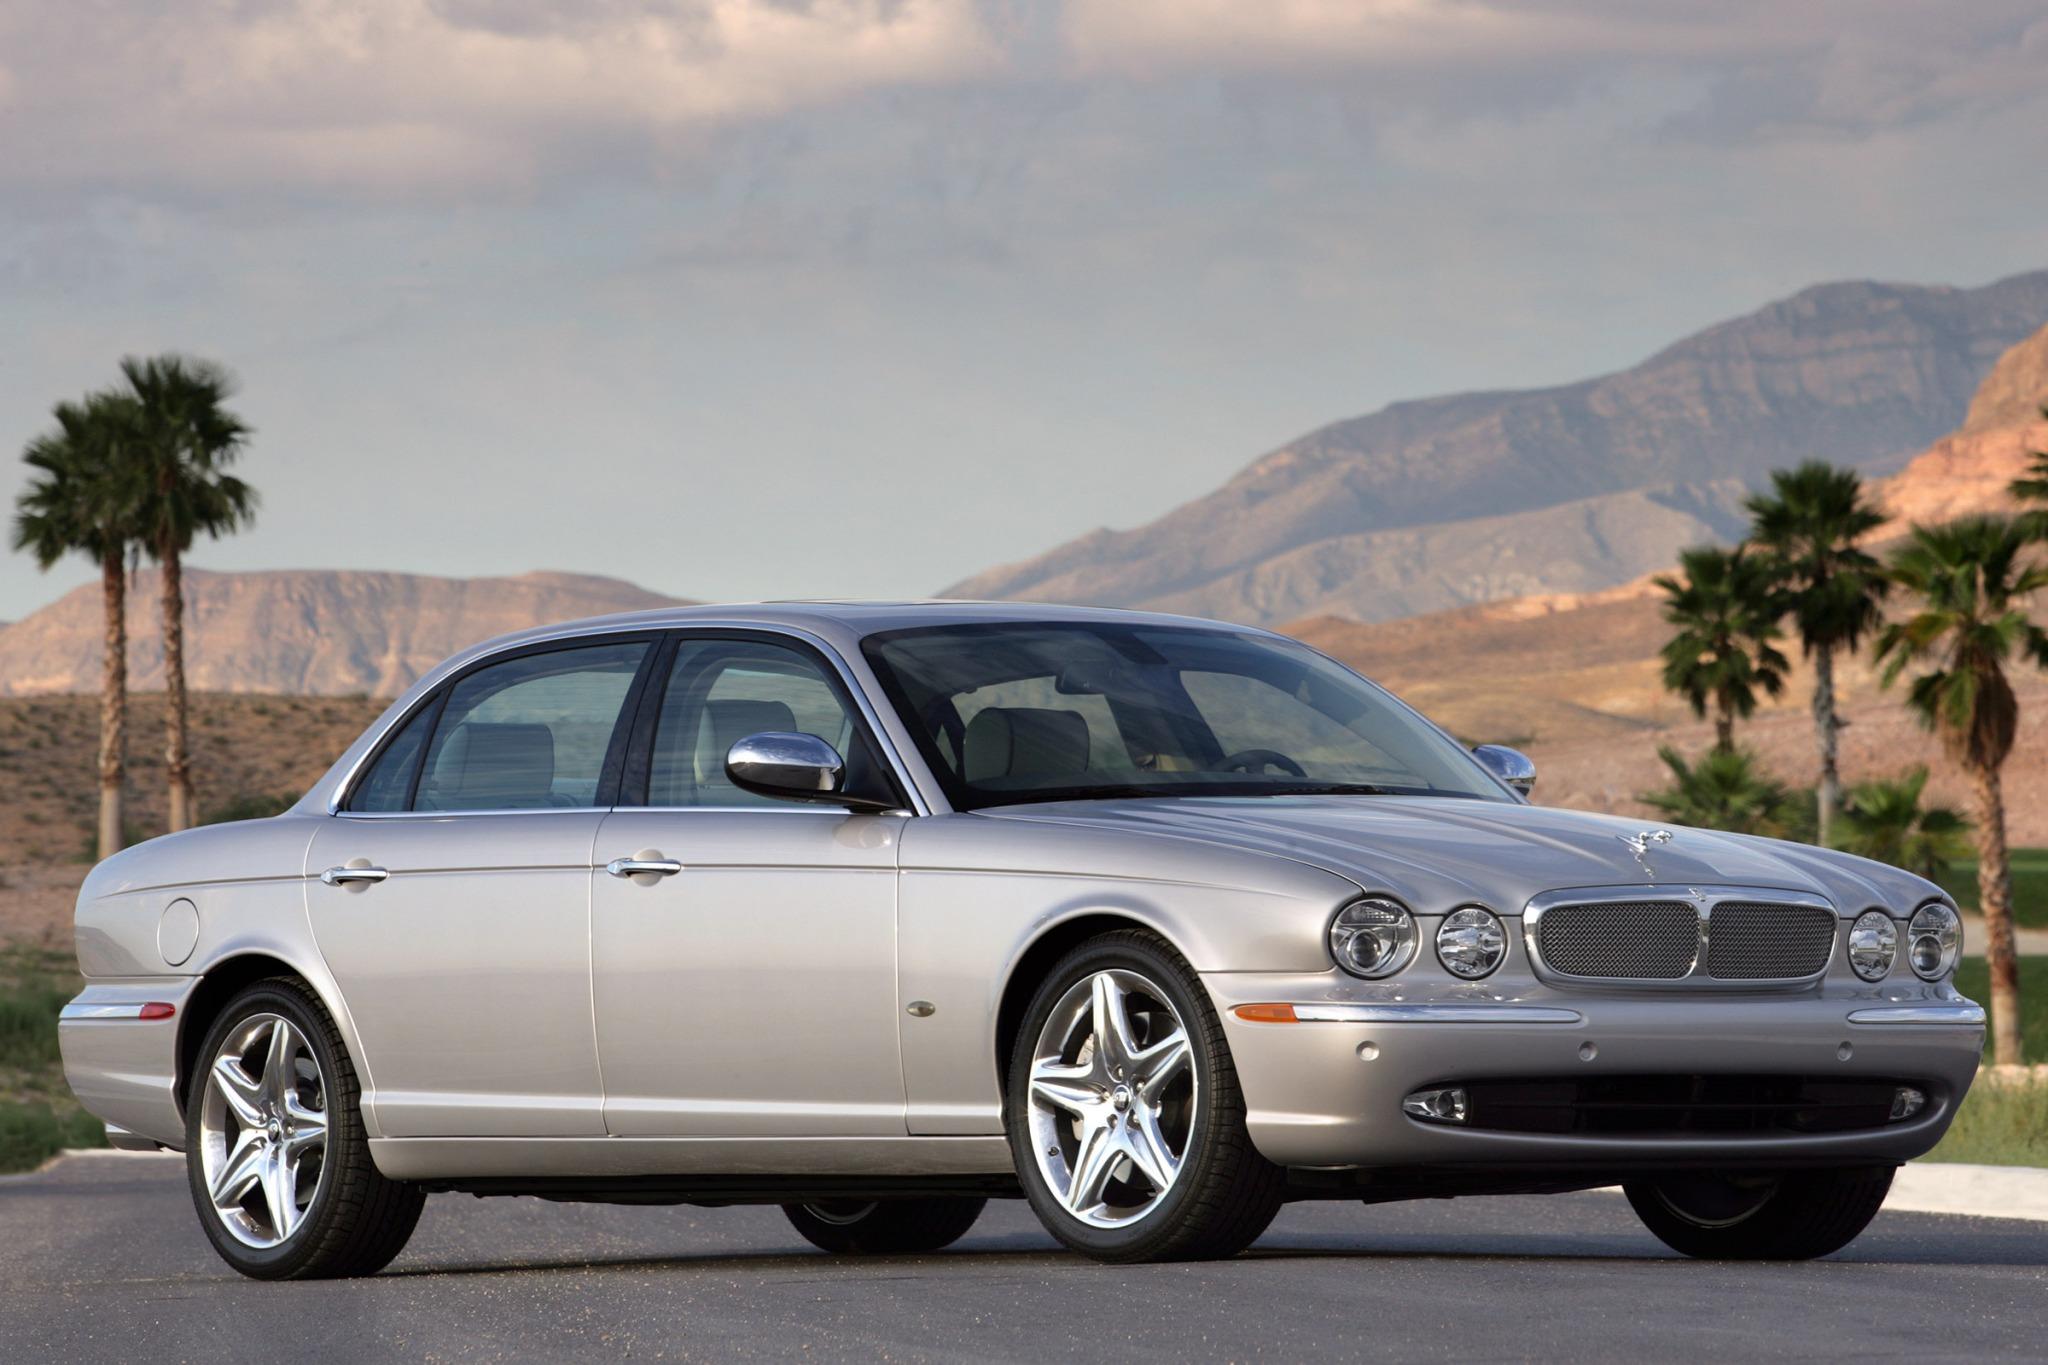 2007 jaguar xj series sedan super v8 fq oem 3 2048